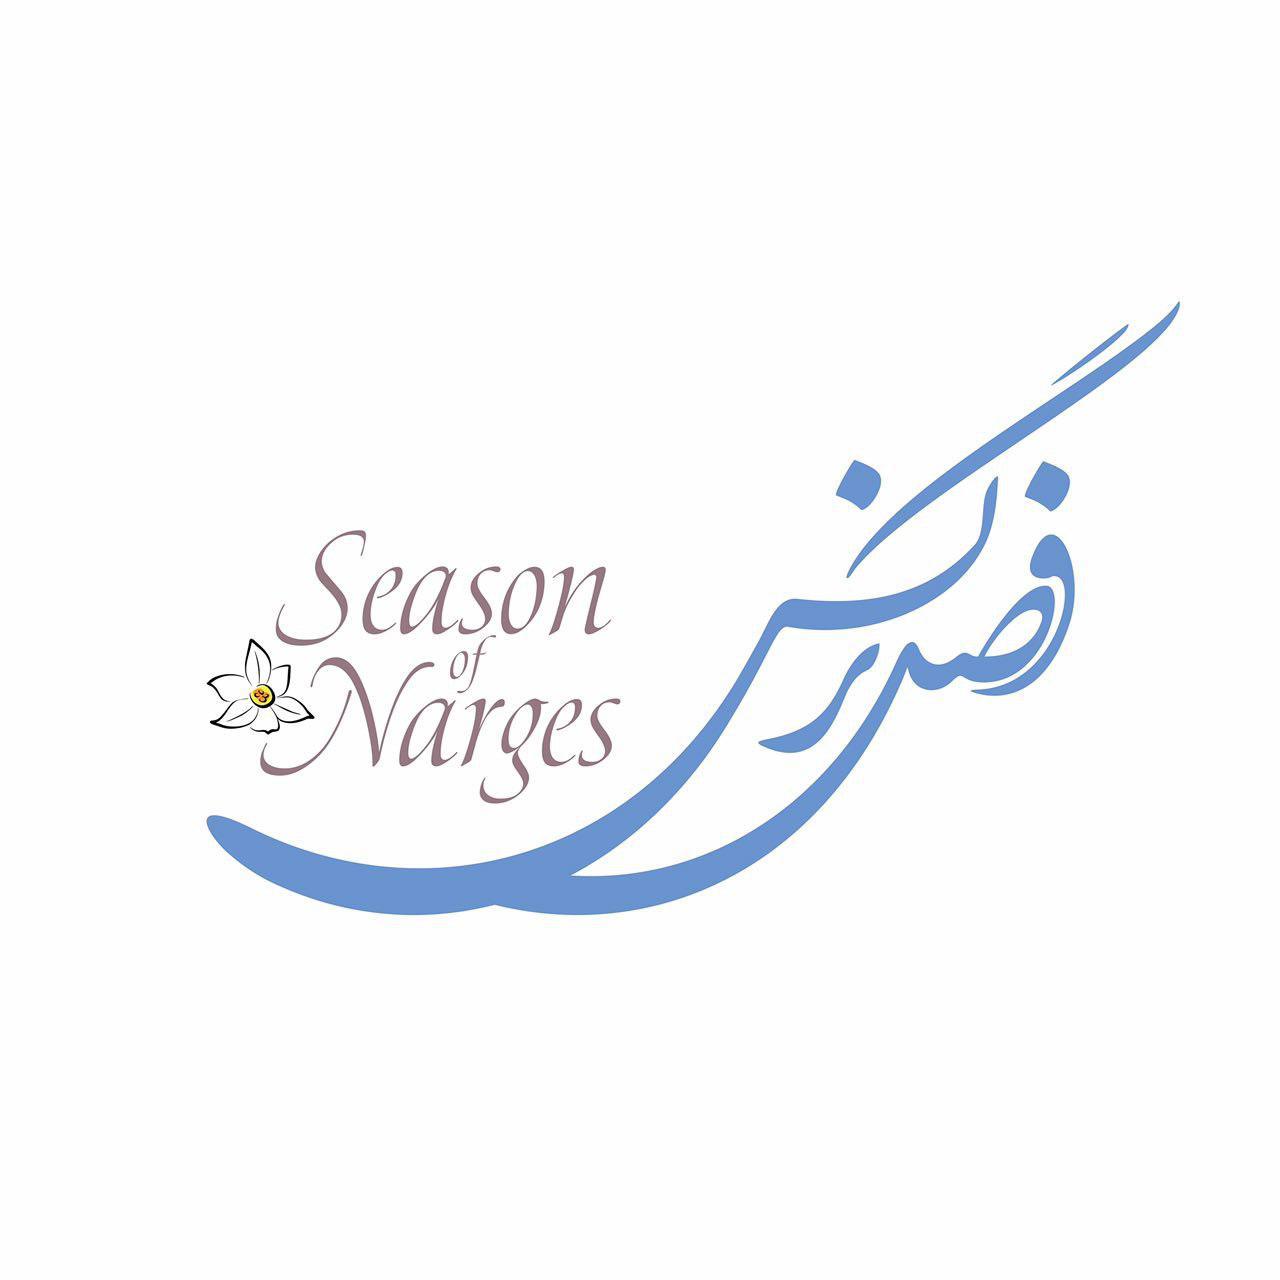 لوگوی «فصل نرگس» رونمایی شد